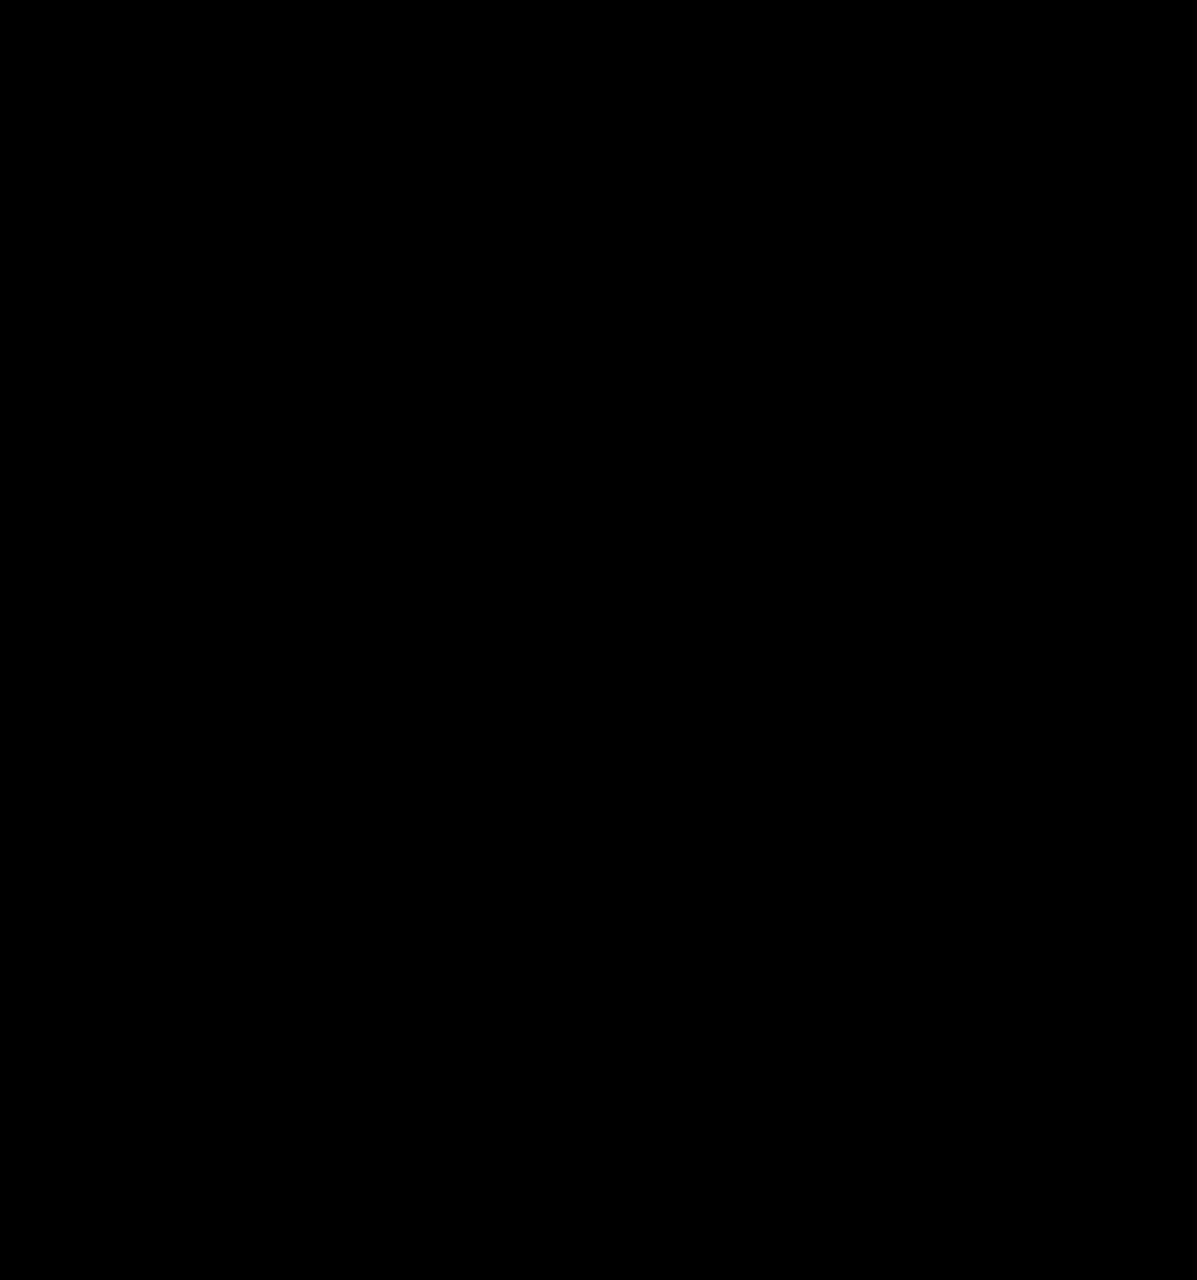 Apple Black Fruit Silhouette PNG.